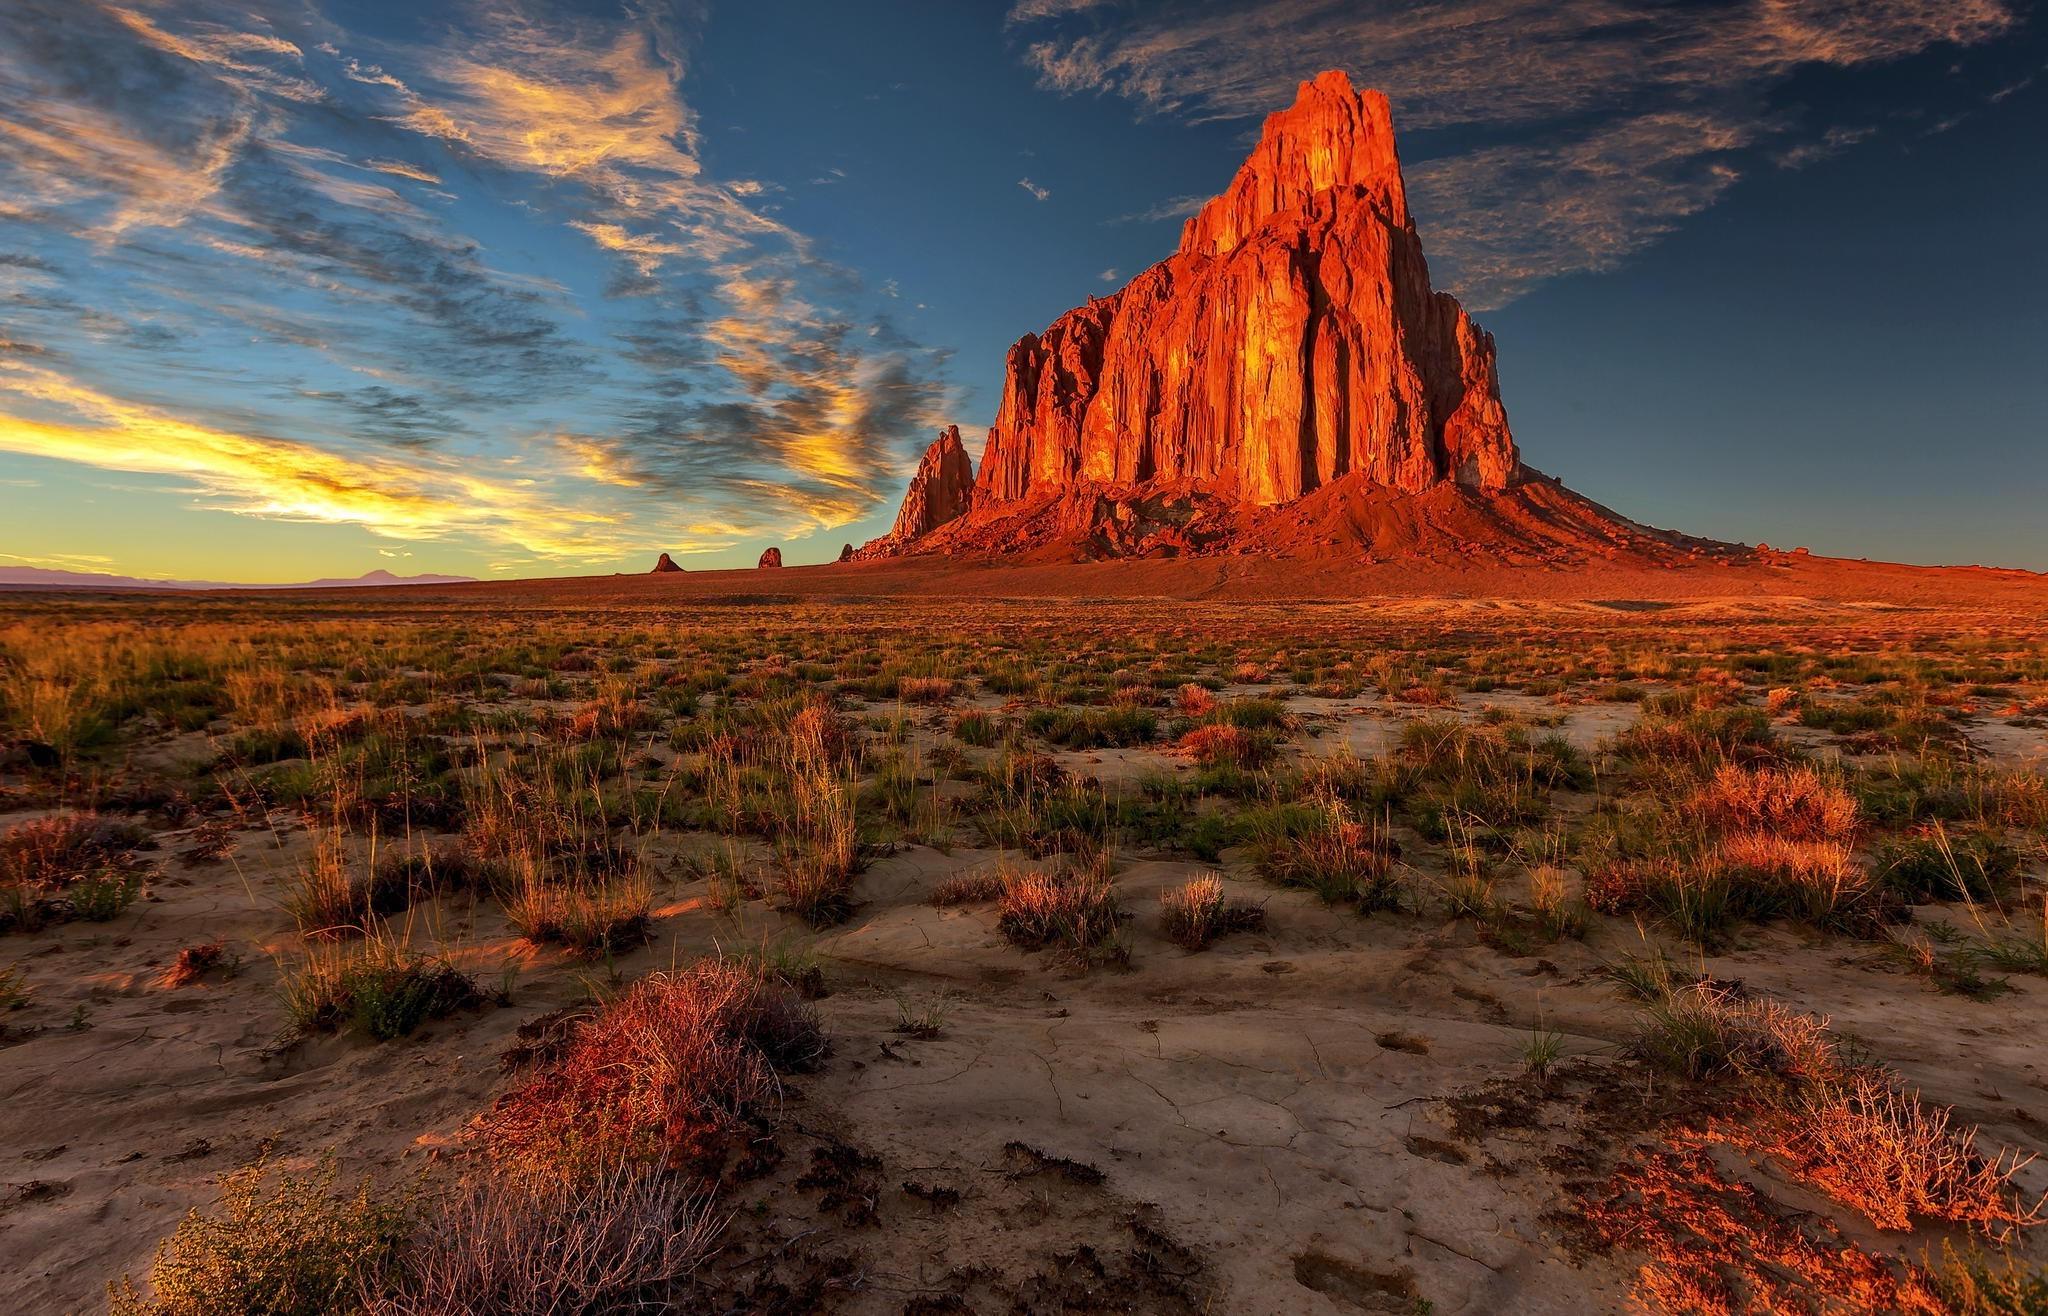 2048x1316 Px Desert Landscape Mountain Nature Sandstone